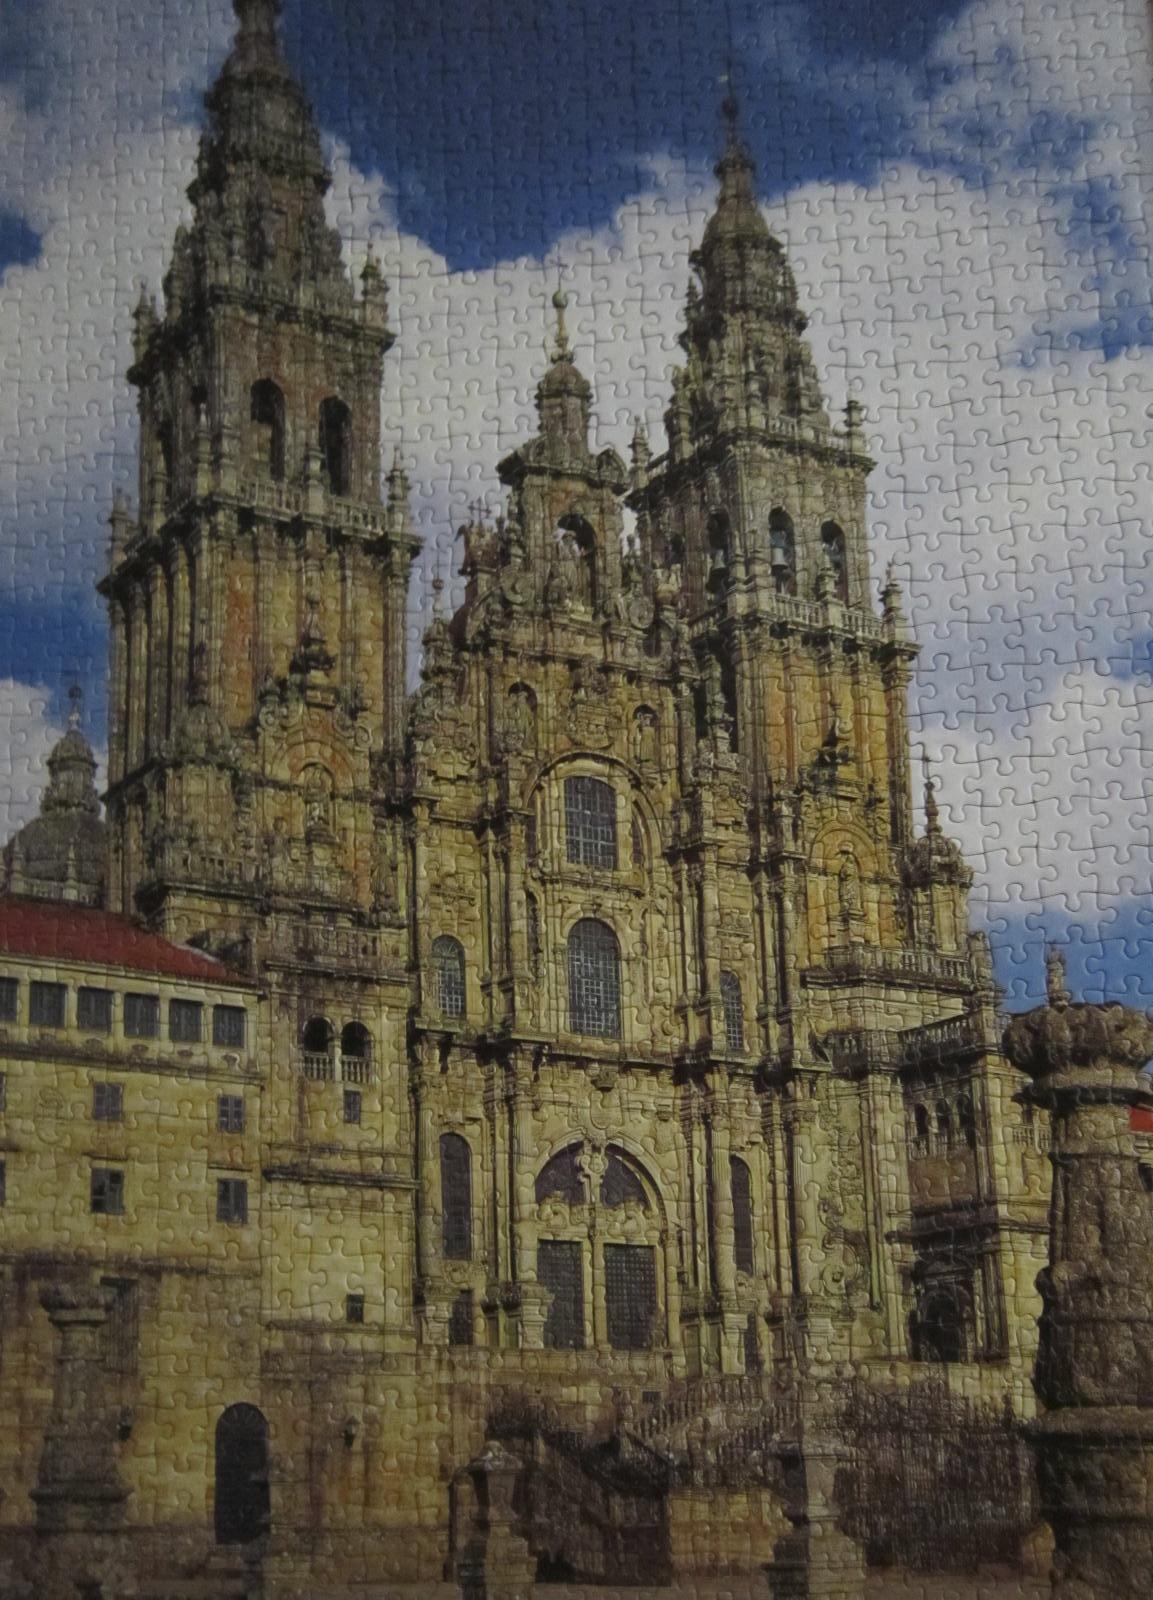 Cathedral of Santiago de Compostela (jigsawversion)